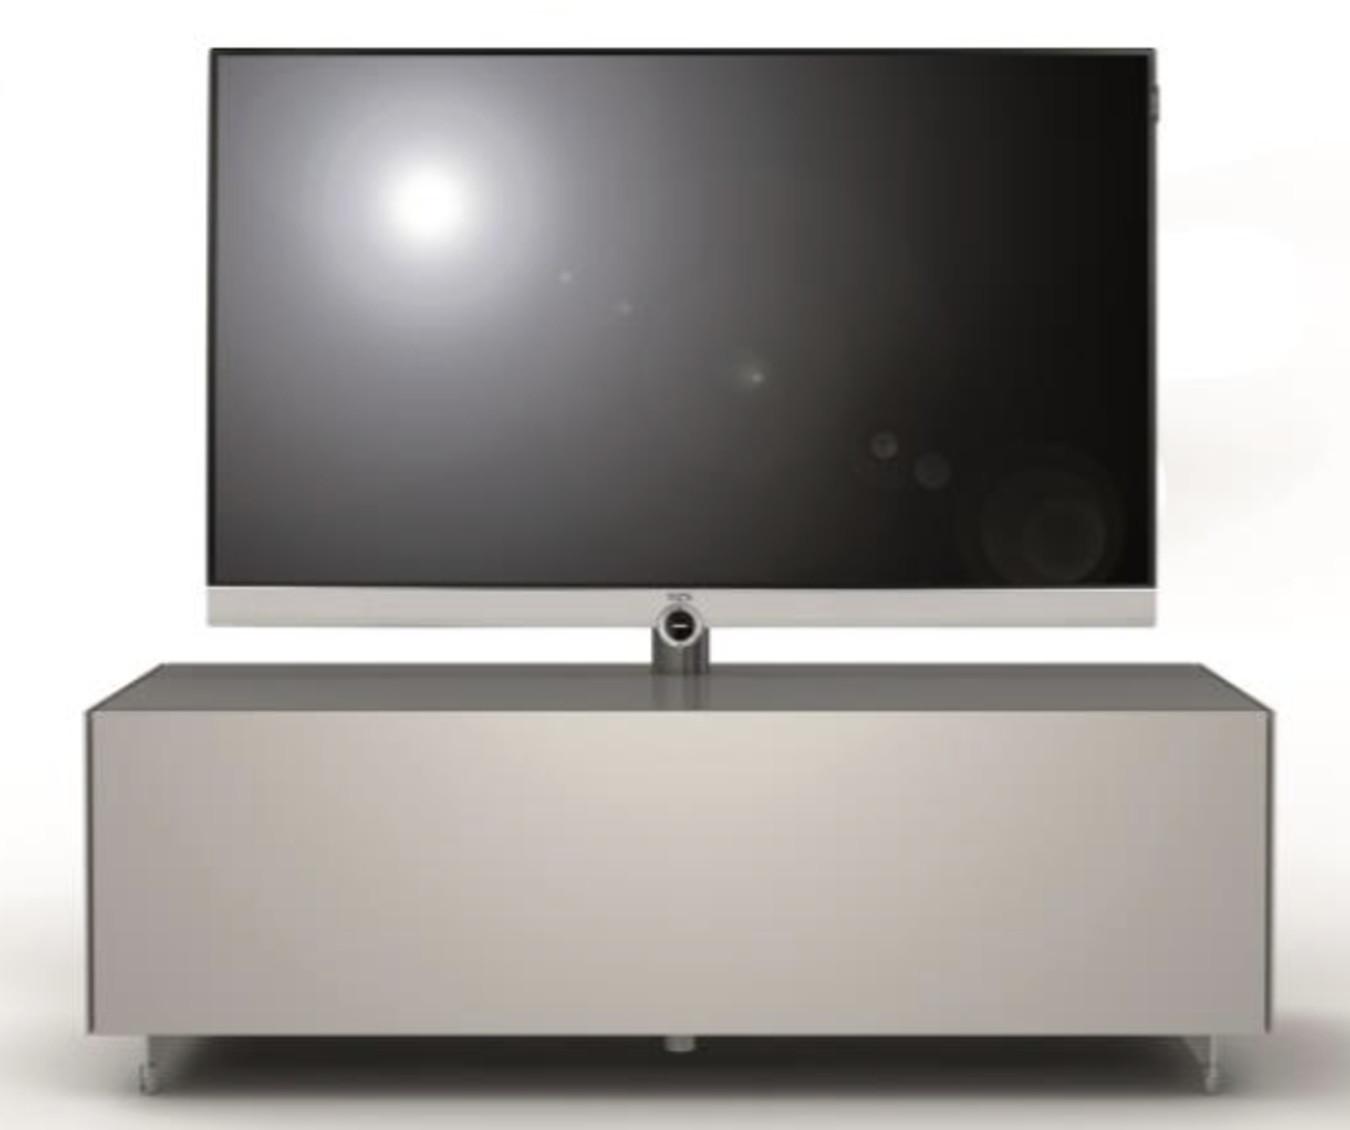 loewe spectral modell s zubeh r loewe fernseher. Black Bedroom Furniture Sets. Home Design Ideas